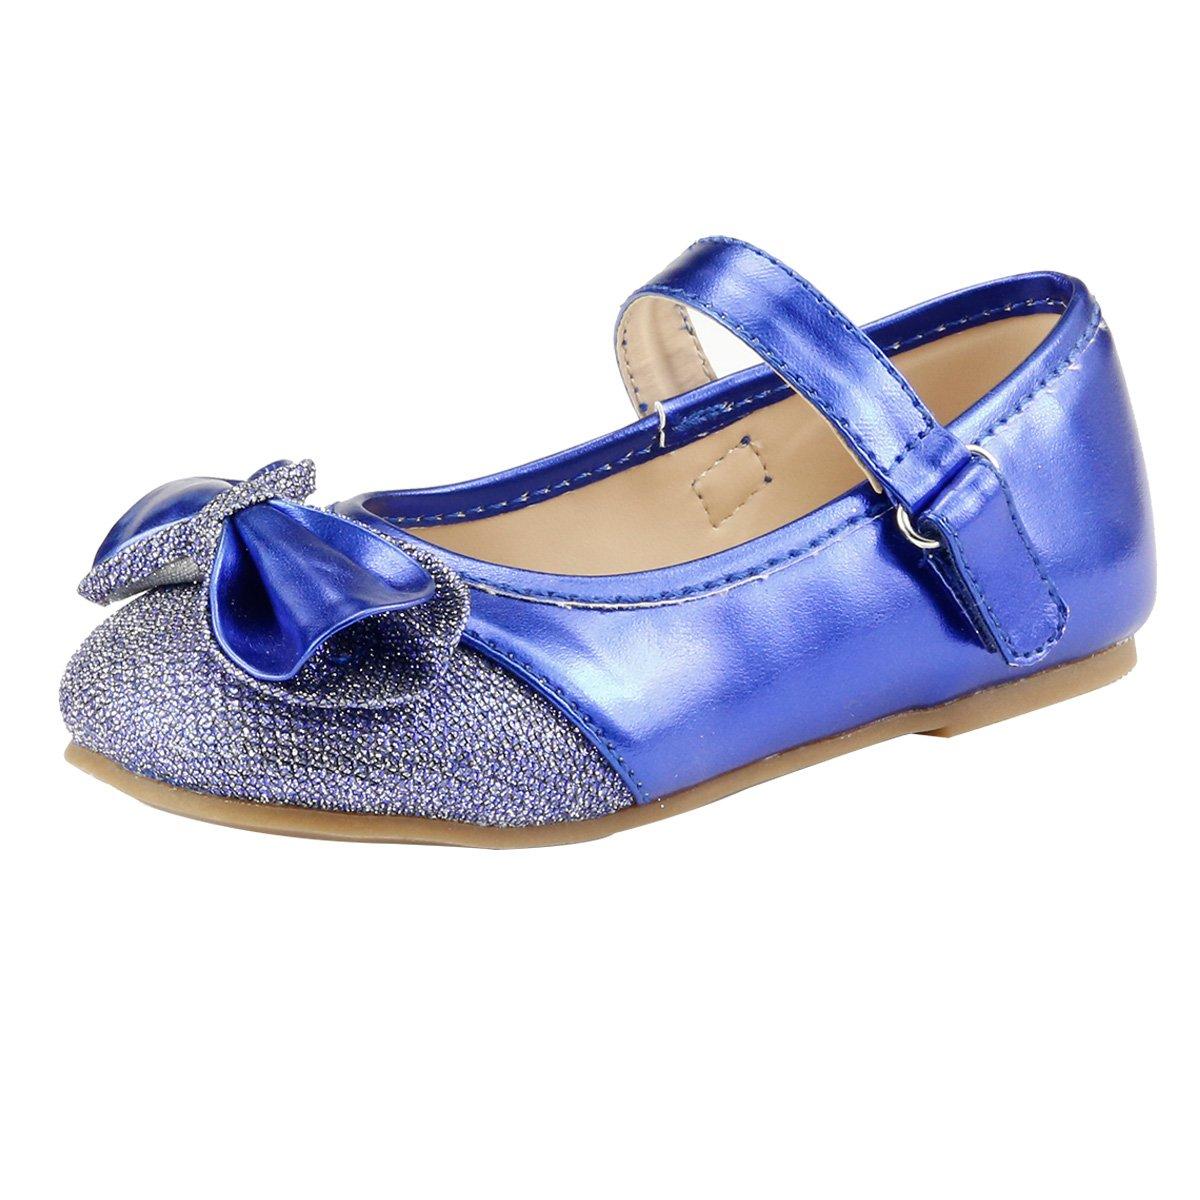 Toddler Sz 10 Girls Dress Shoes Glitter Wedding Party Sparkle Shine Blue